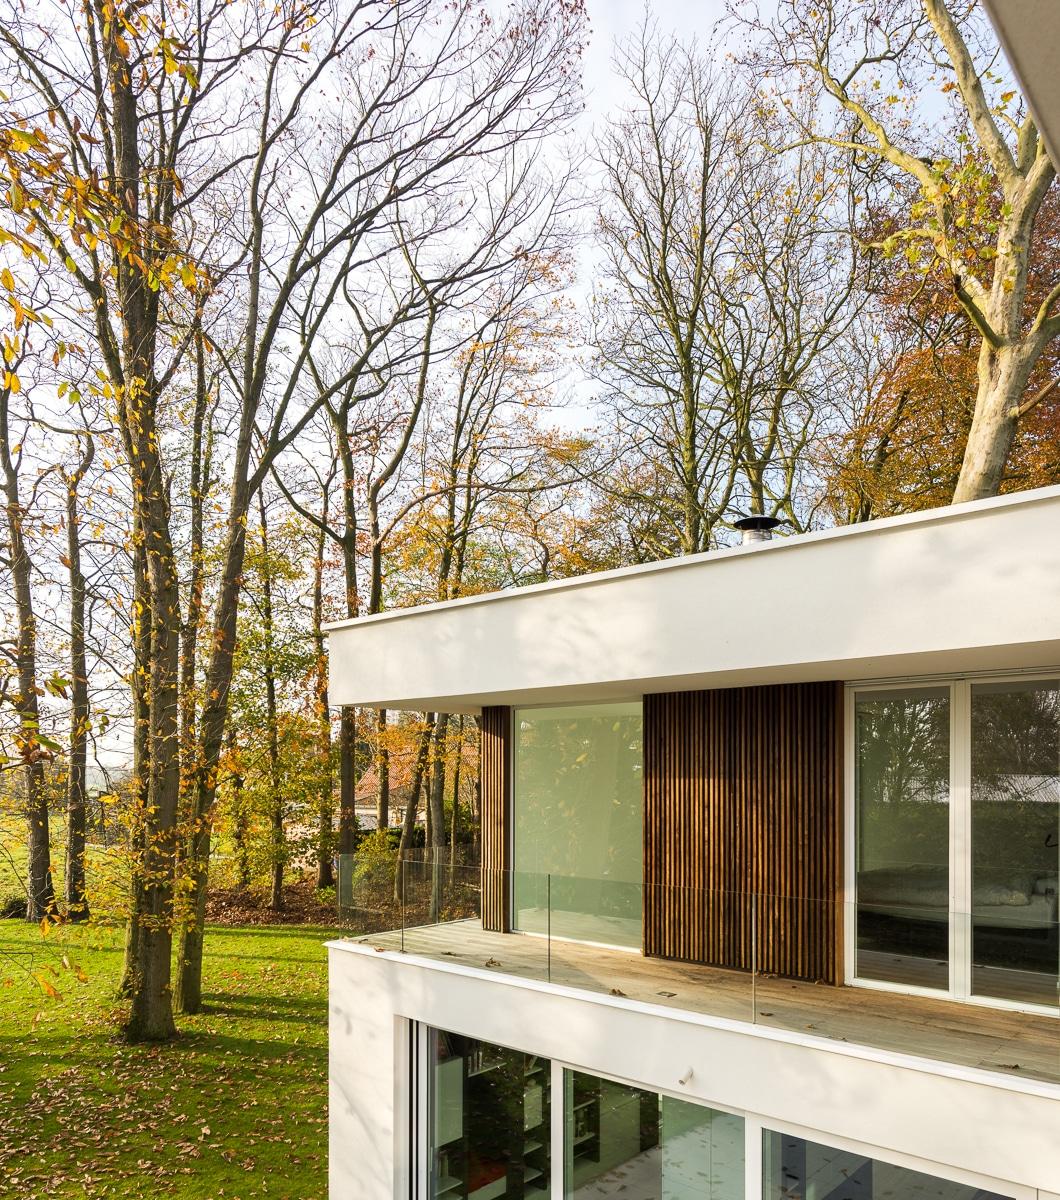 BB Emma 031web | Baeyens & Beck architecten Gent | architect nieuwbouw renovatie interieur | high end | architectenbureau